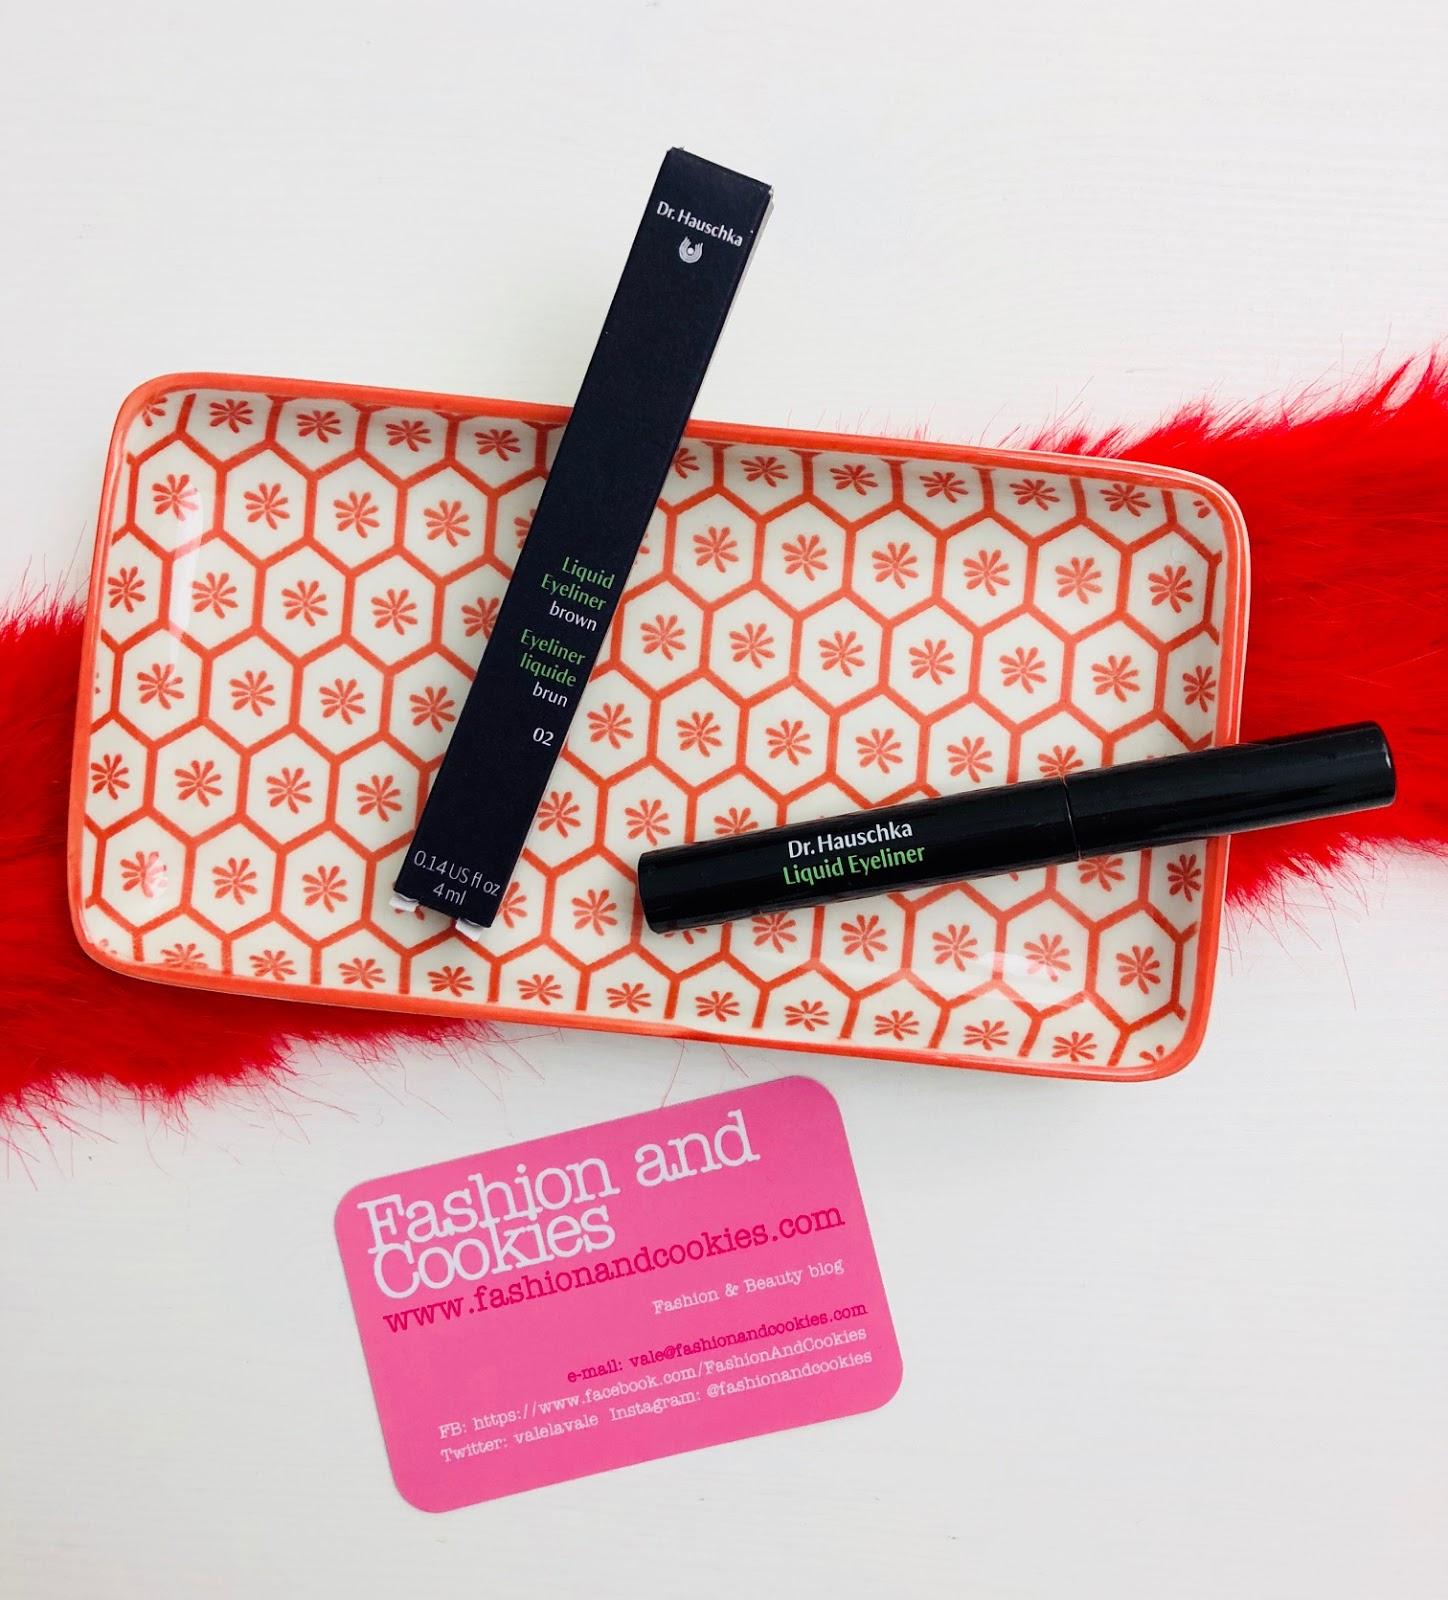 Liquid Eyeliner di Dr. Hauschka: uno sguardo più bello su fashion and cookies beauty blog, beauty blogger